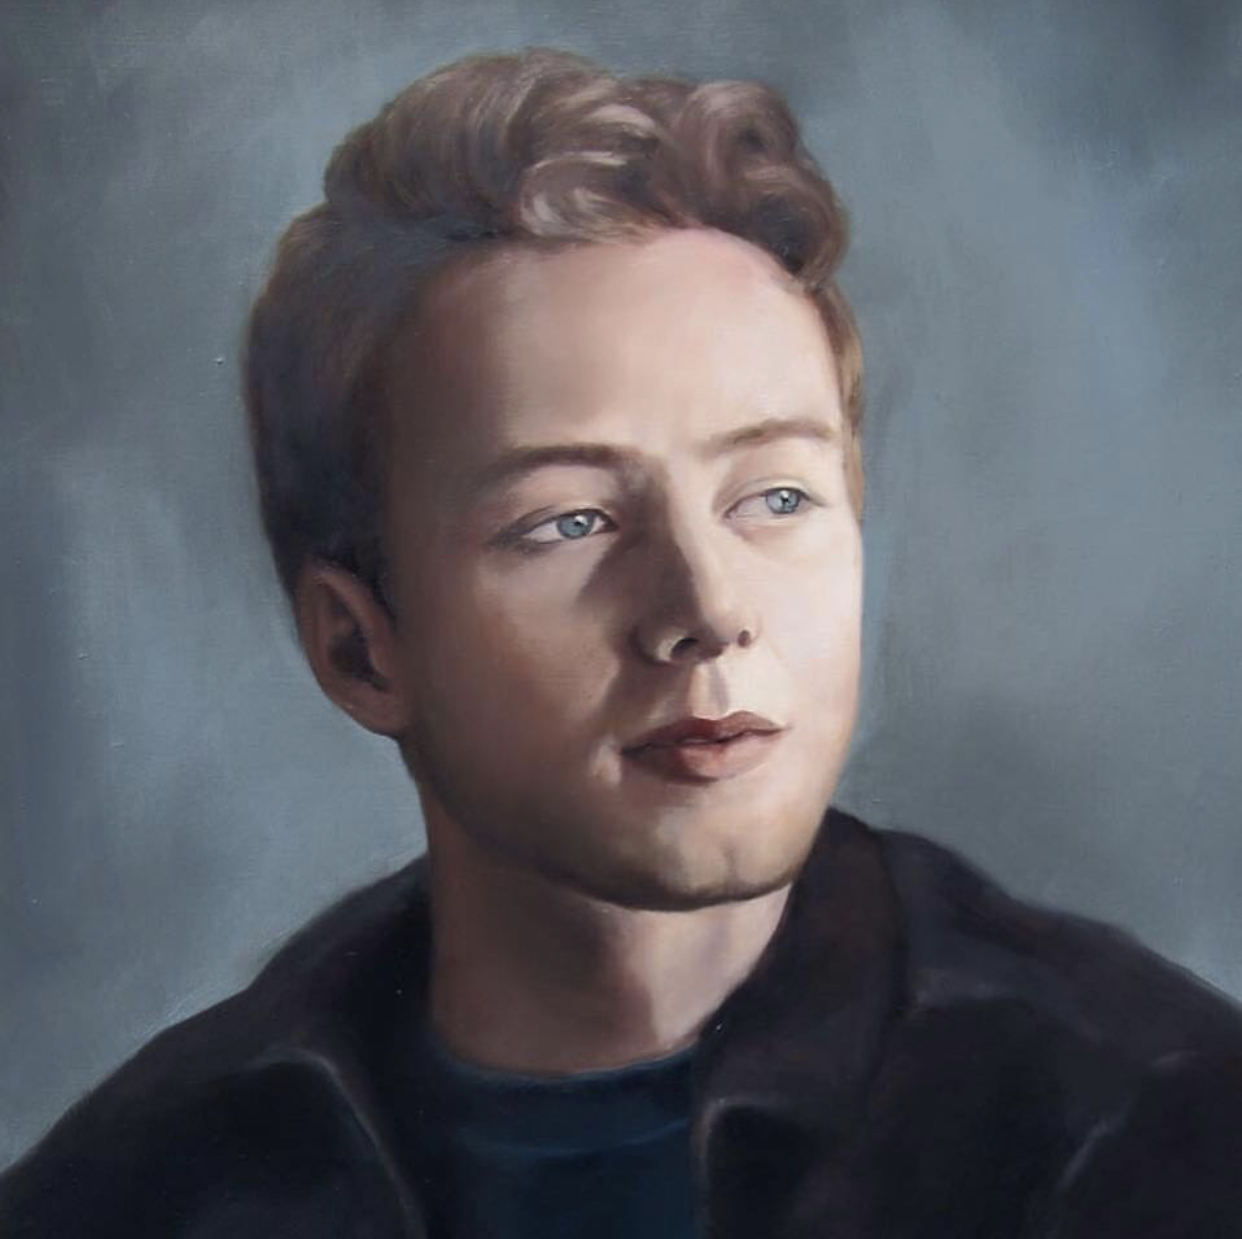 Portrait of Laurence Fuller by Heidi Yardley